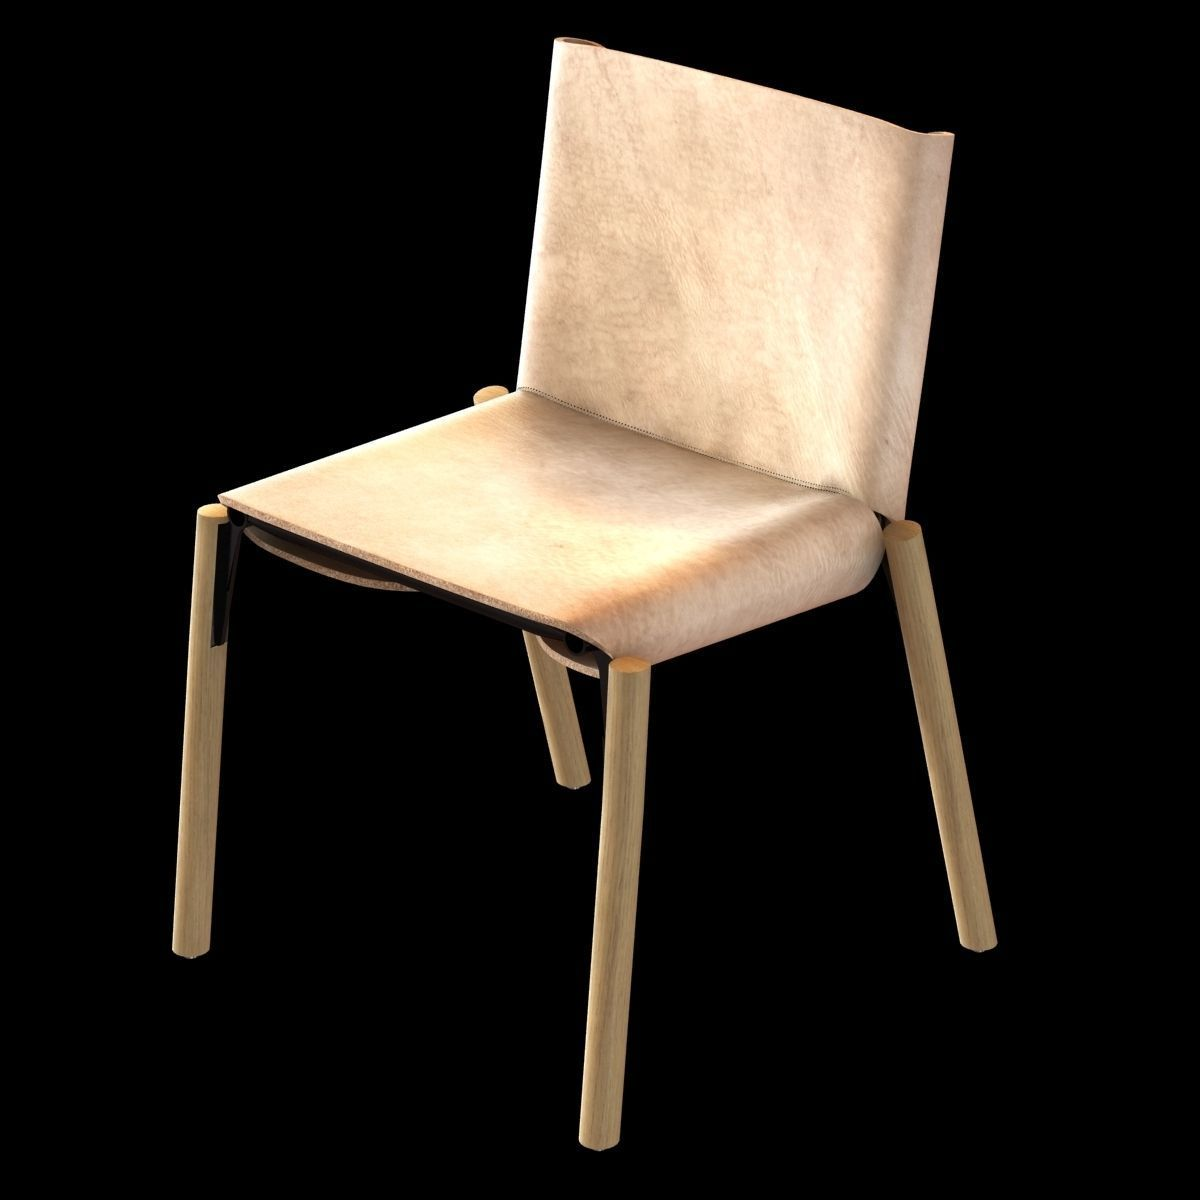 kristalia 1085 edition hide leather chair 3d model max obj mtl 3ds fbx  unitypackage prefab ...